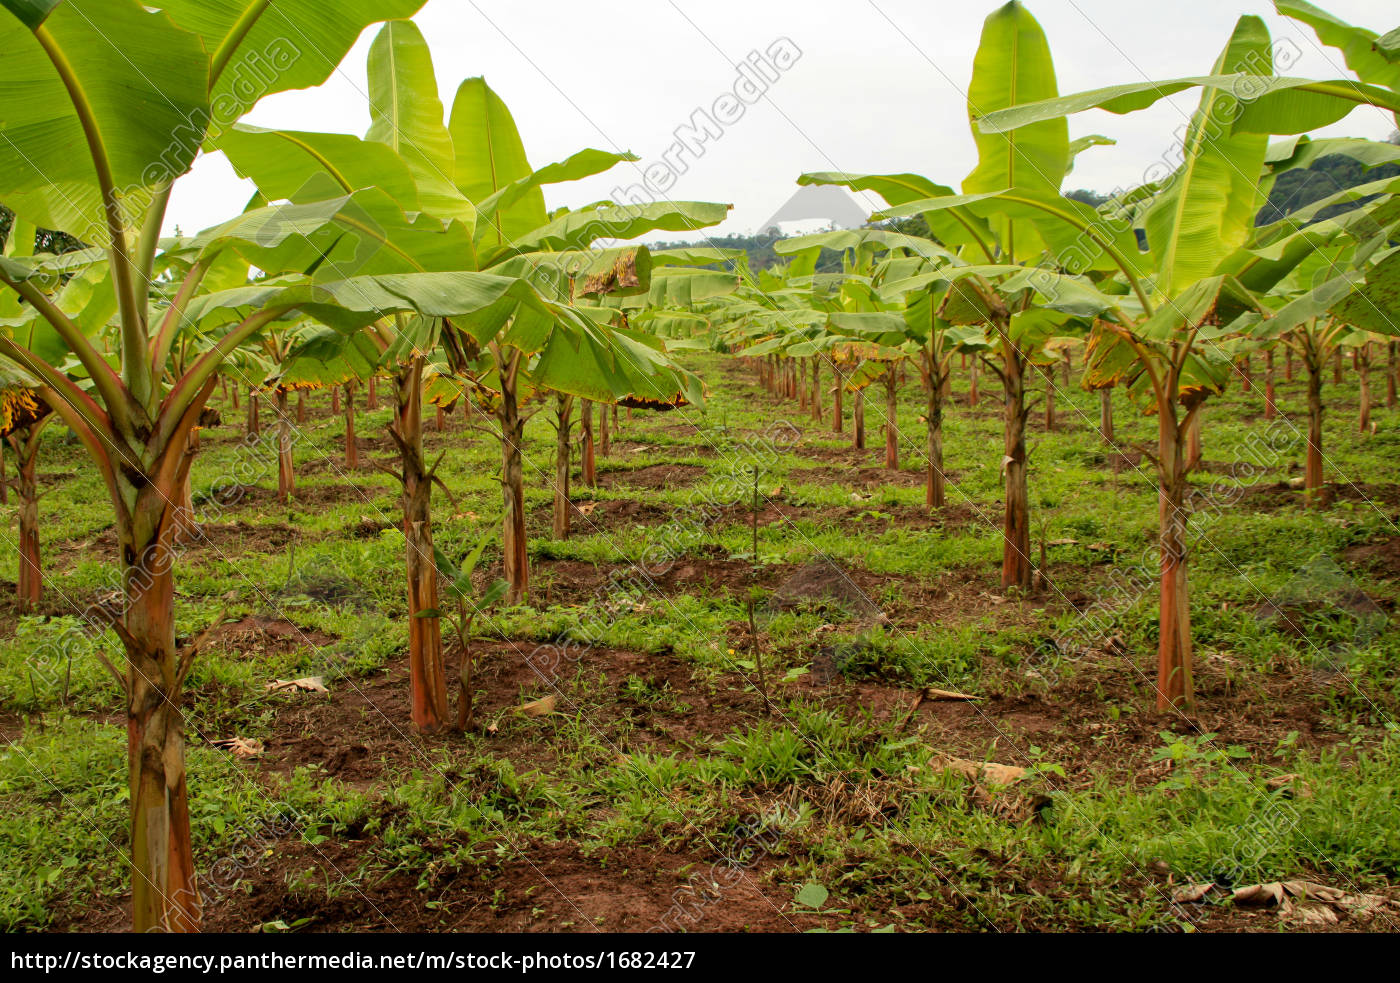 bananenplantage, in, südamerika - 1682427